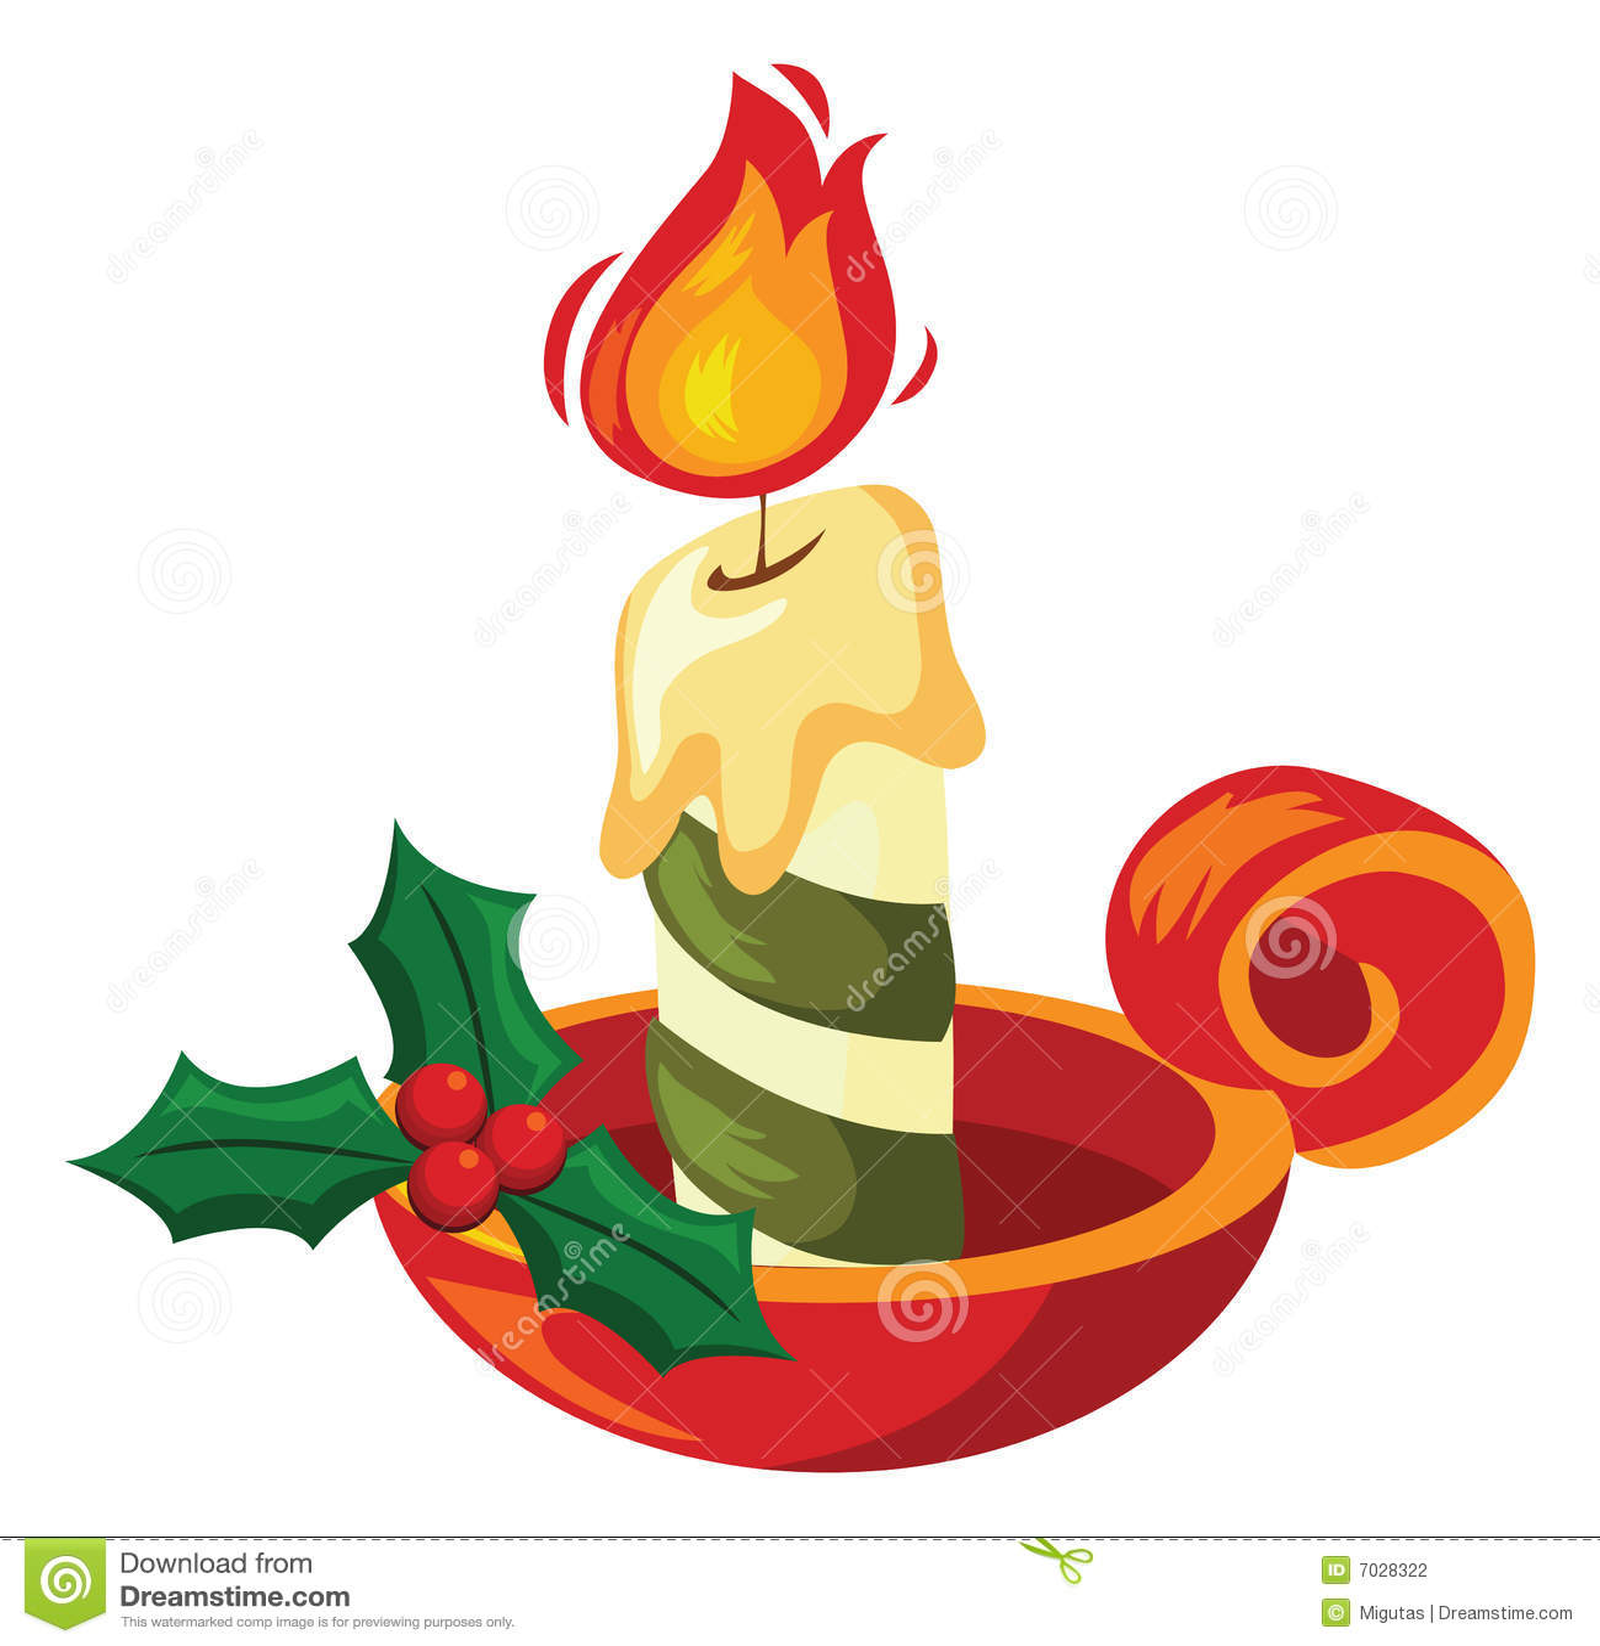 Natal Wallpaper 3d Christmas Candle Stock Photography Image 7028322